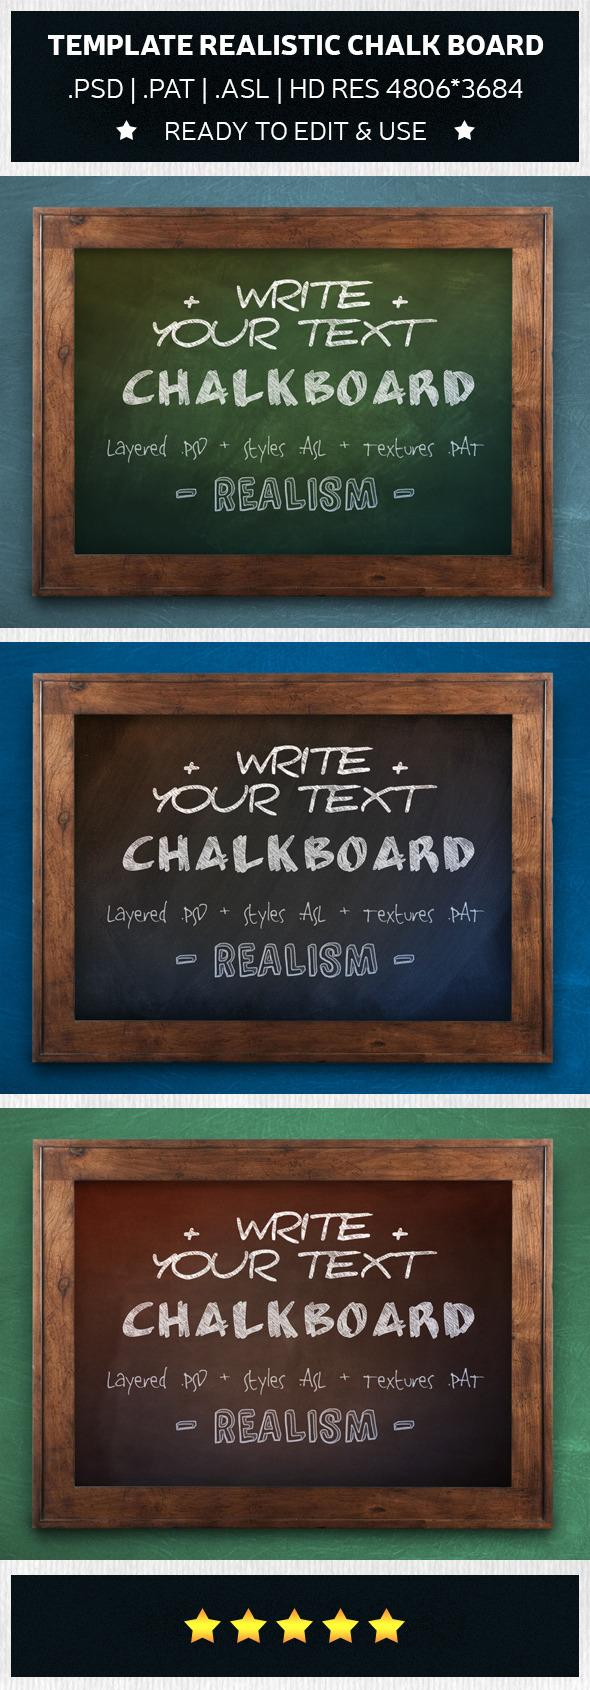 GraphicRiver Chalkboard Realistic Template 9517026